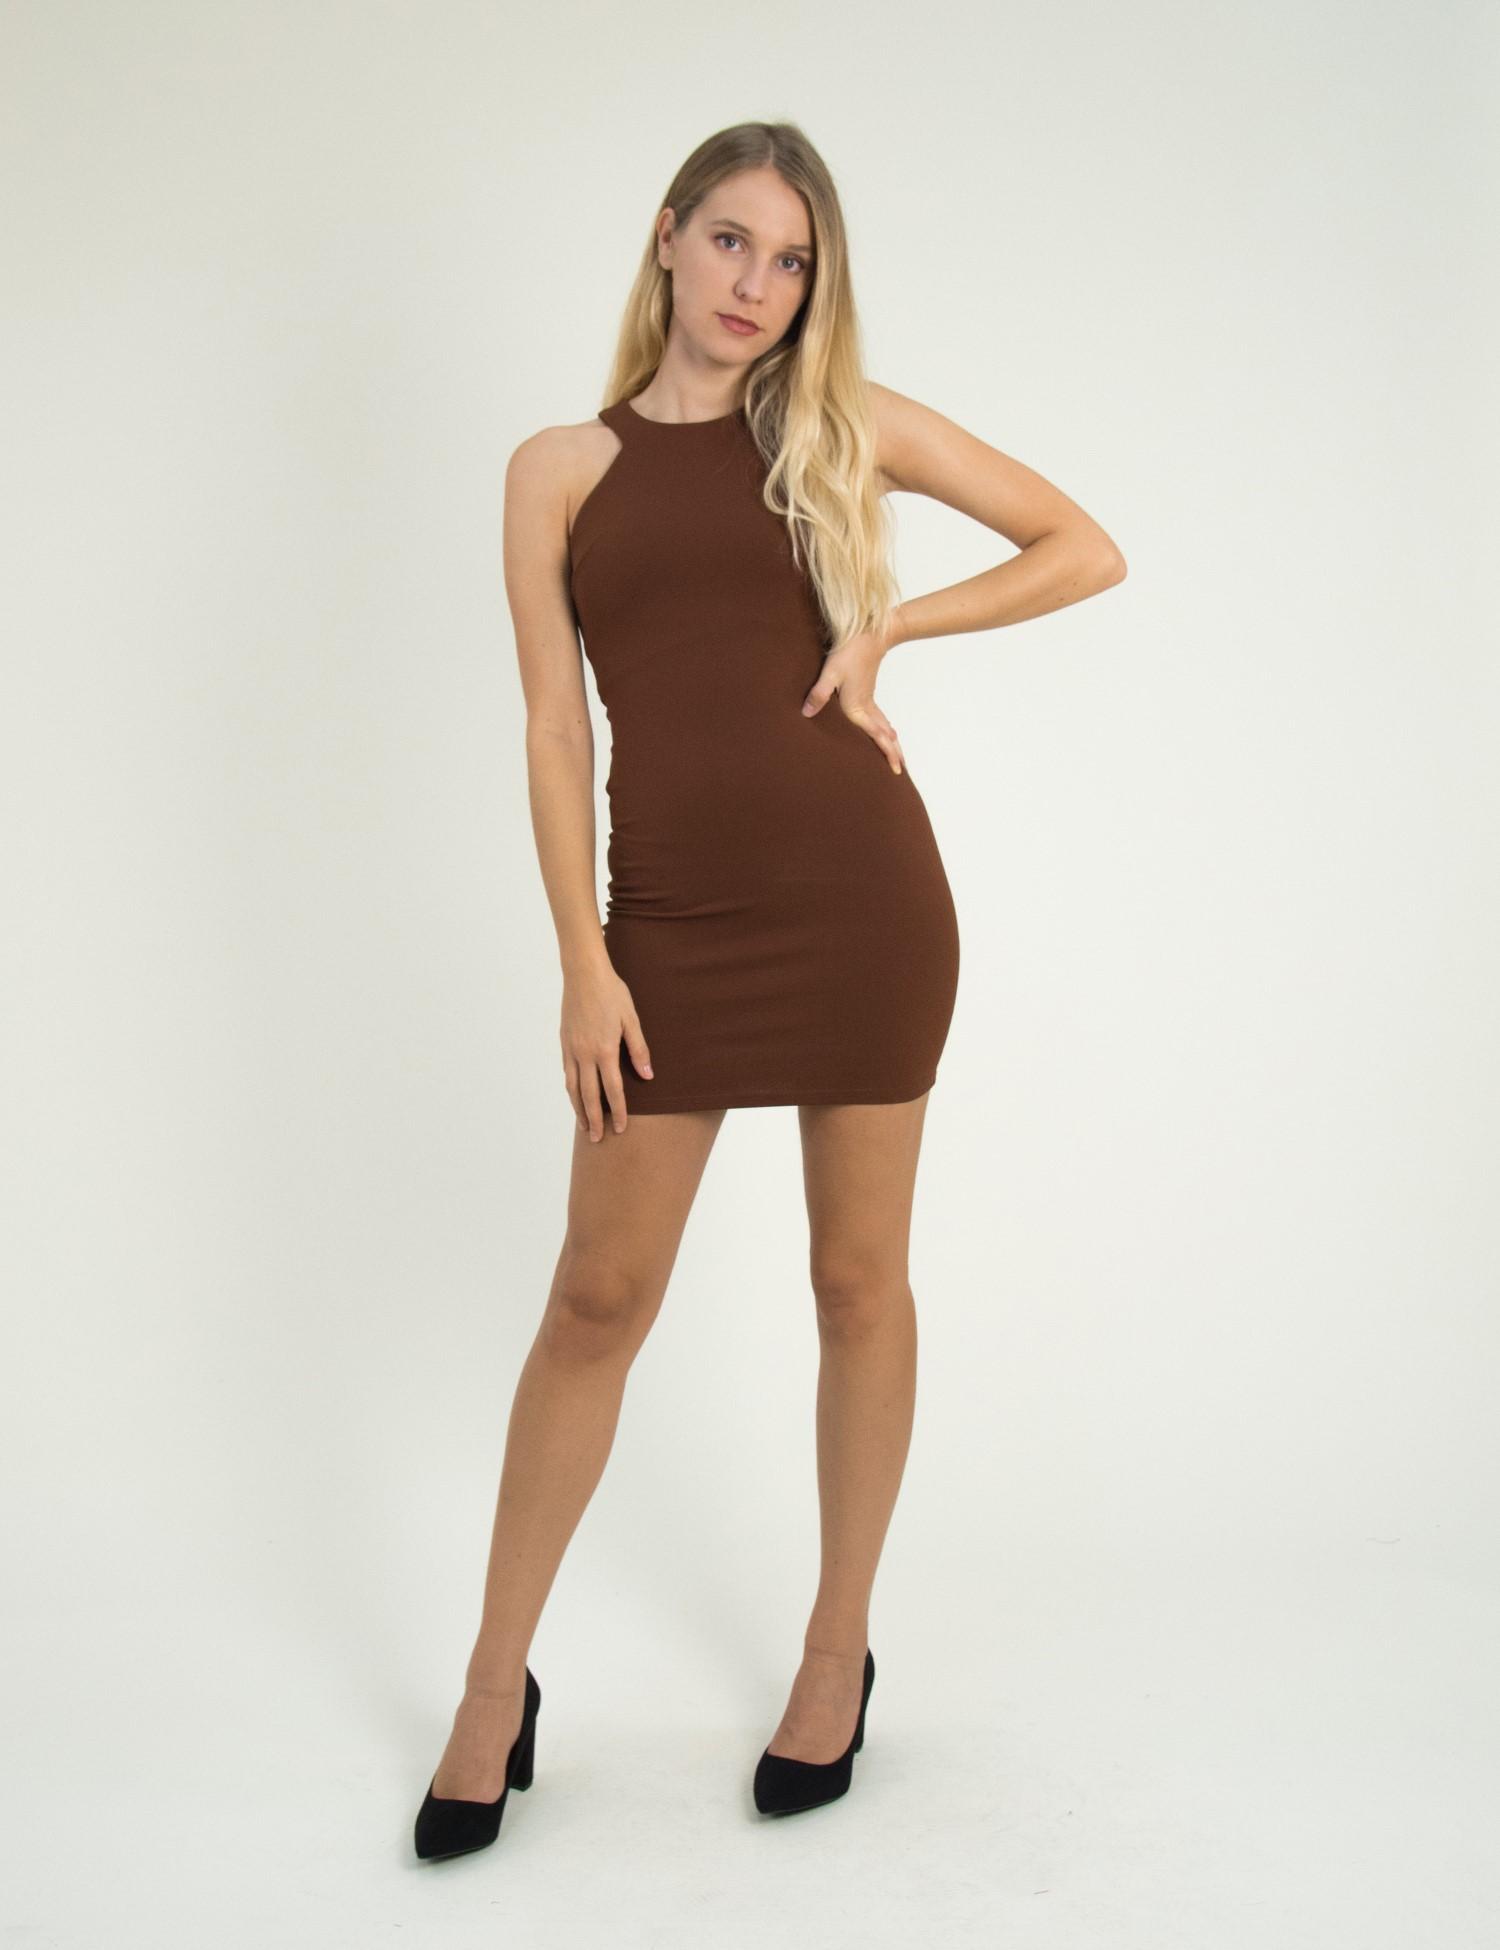 b69ecc68ba57 Torouxo Γυναικείο καφέ ελαστικό φόρεμα Cocktail 014100001F